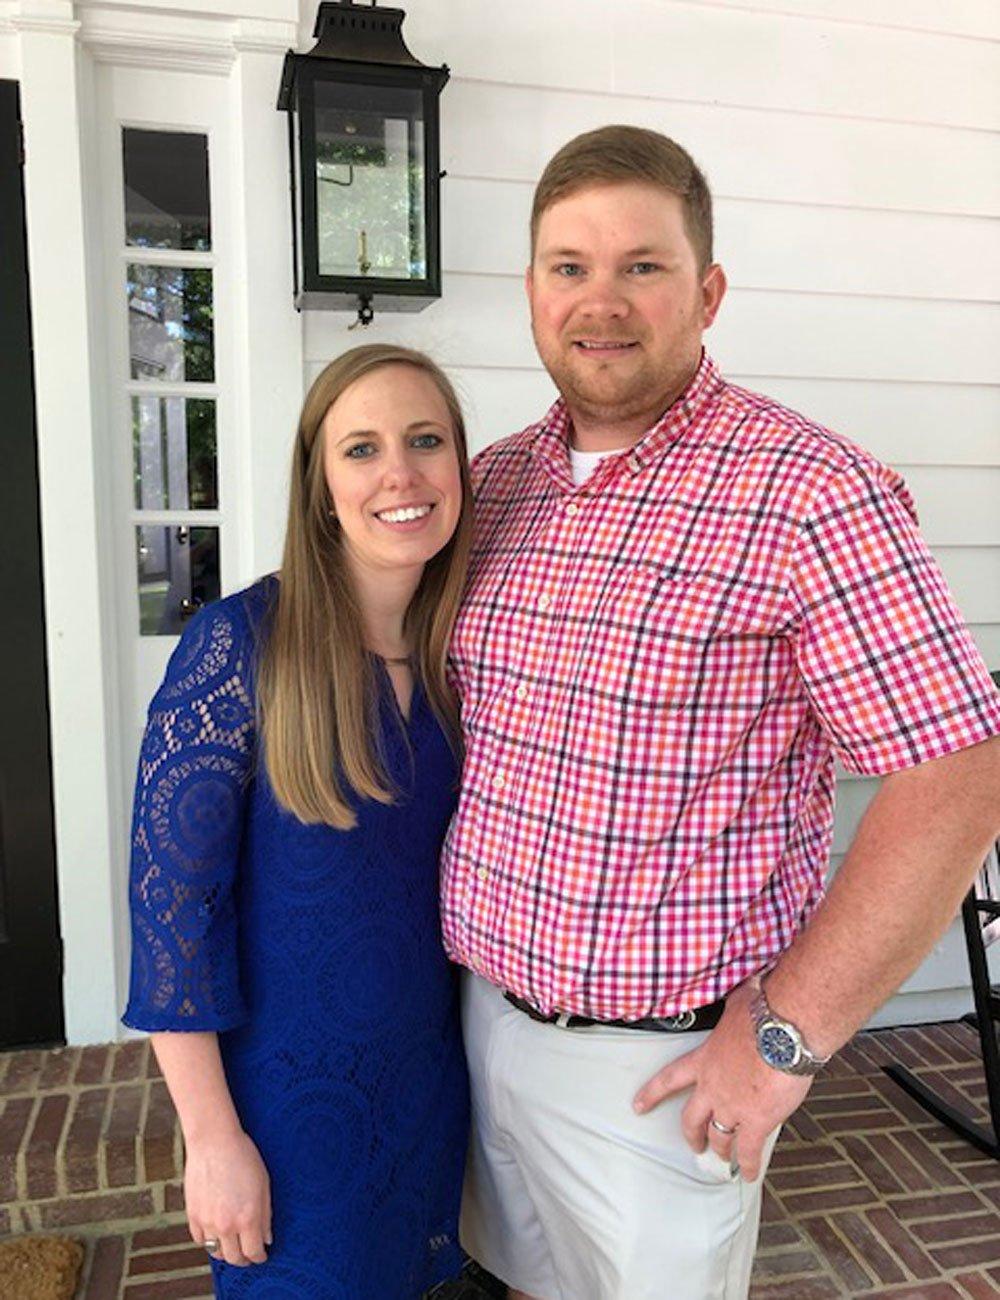 Newlyweds Sarah & Andrew Spivey